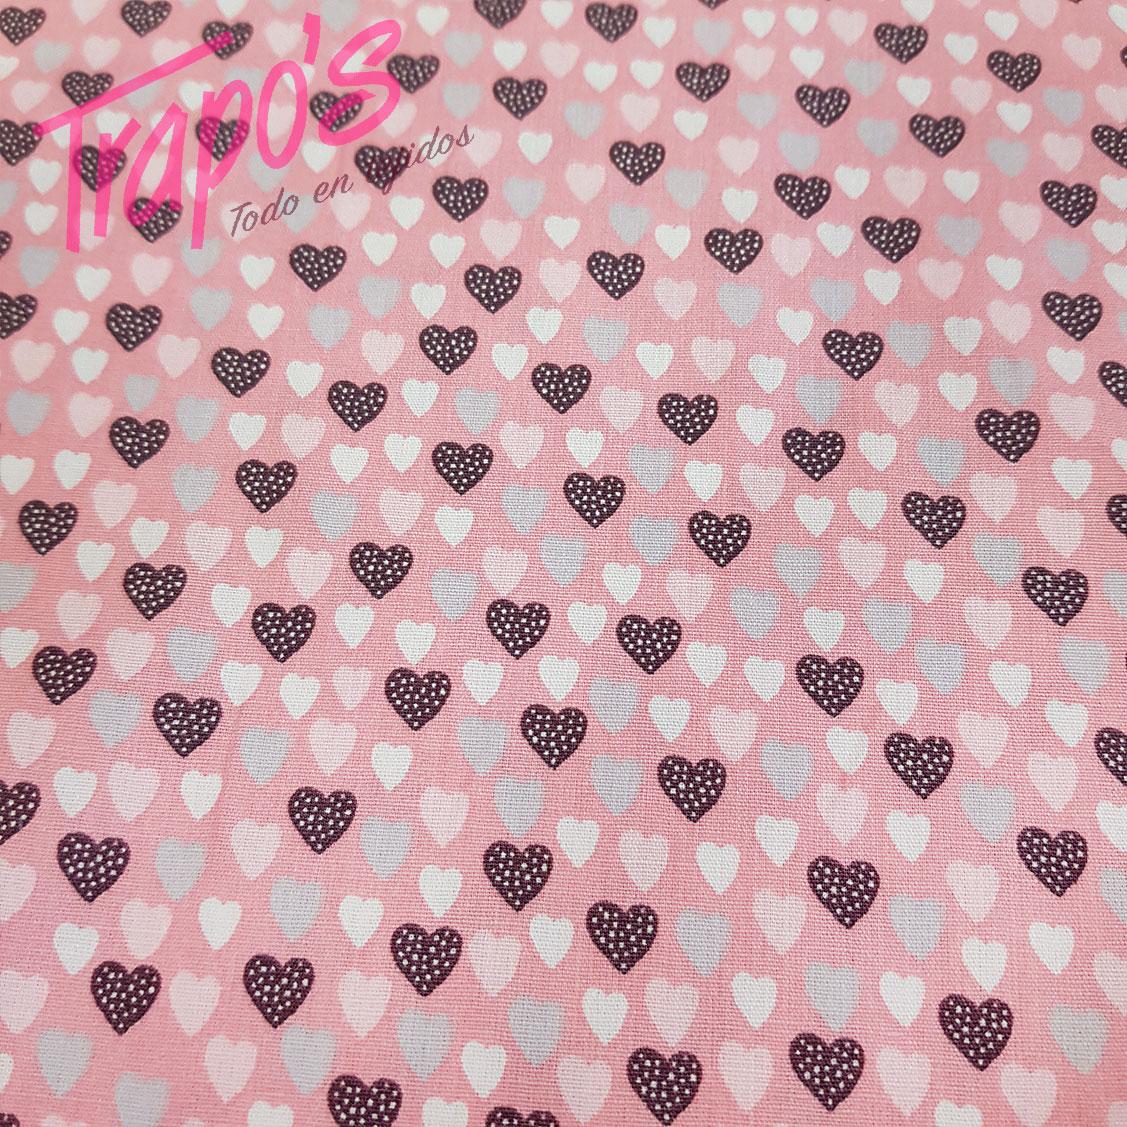 corazon-rosa2